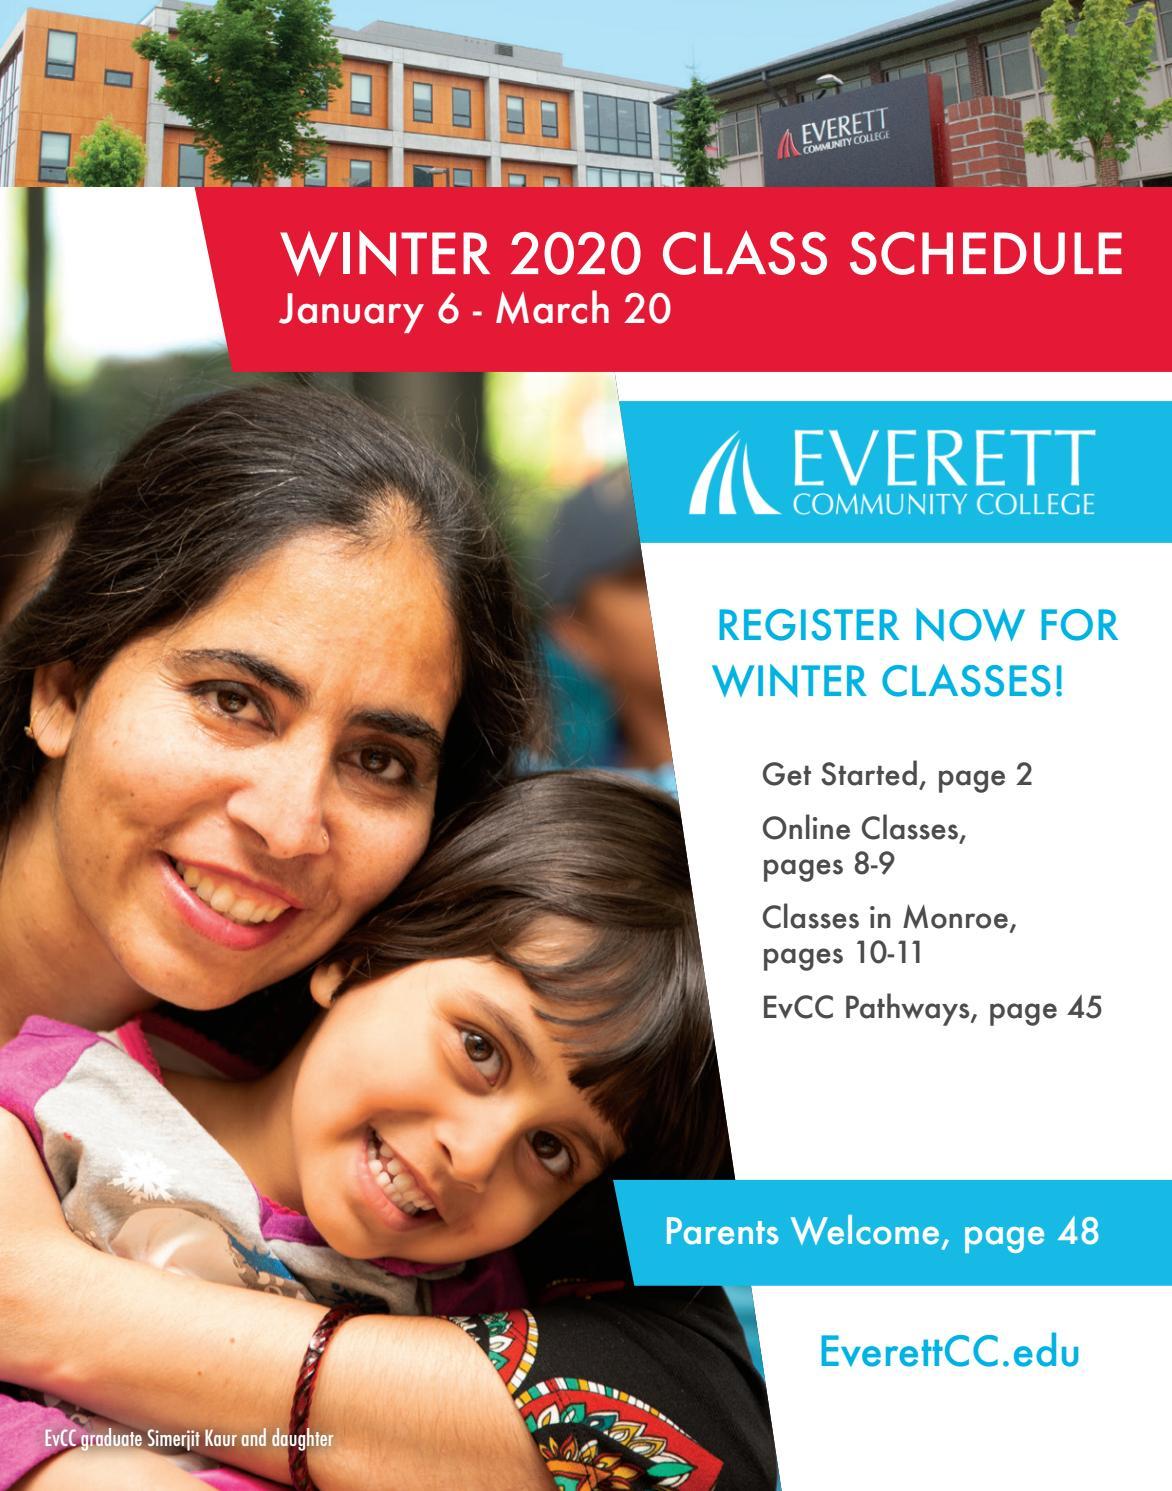 Winter 2020 Classes.Winter 2020 Class Schedule By Everett Community College Issuu